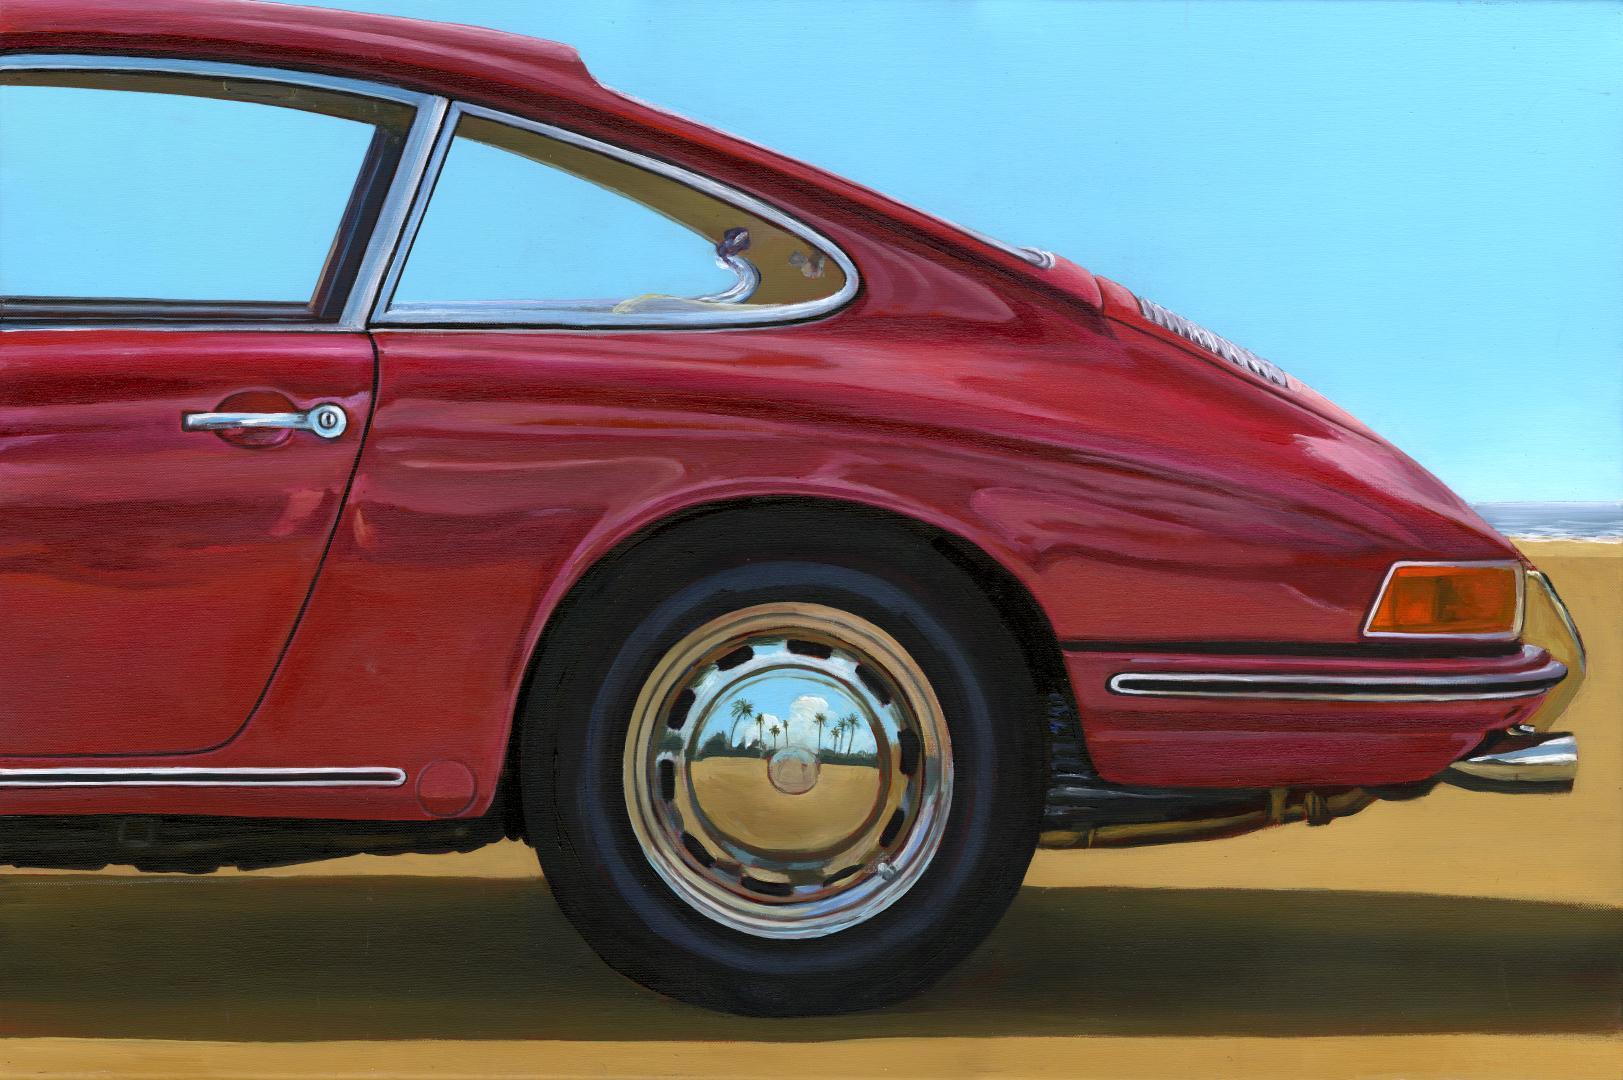 A SUMMER IN SANTA MONICA Porsche 911 S (ARRIERE)- original oil car painting